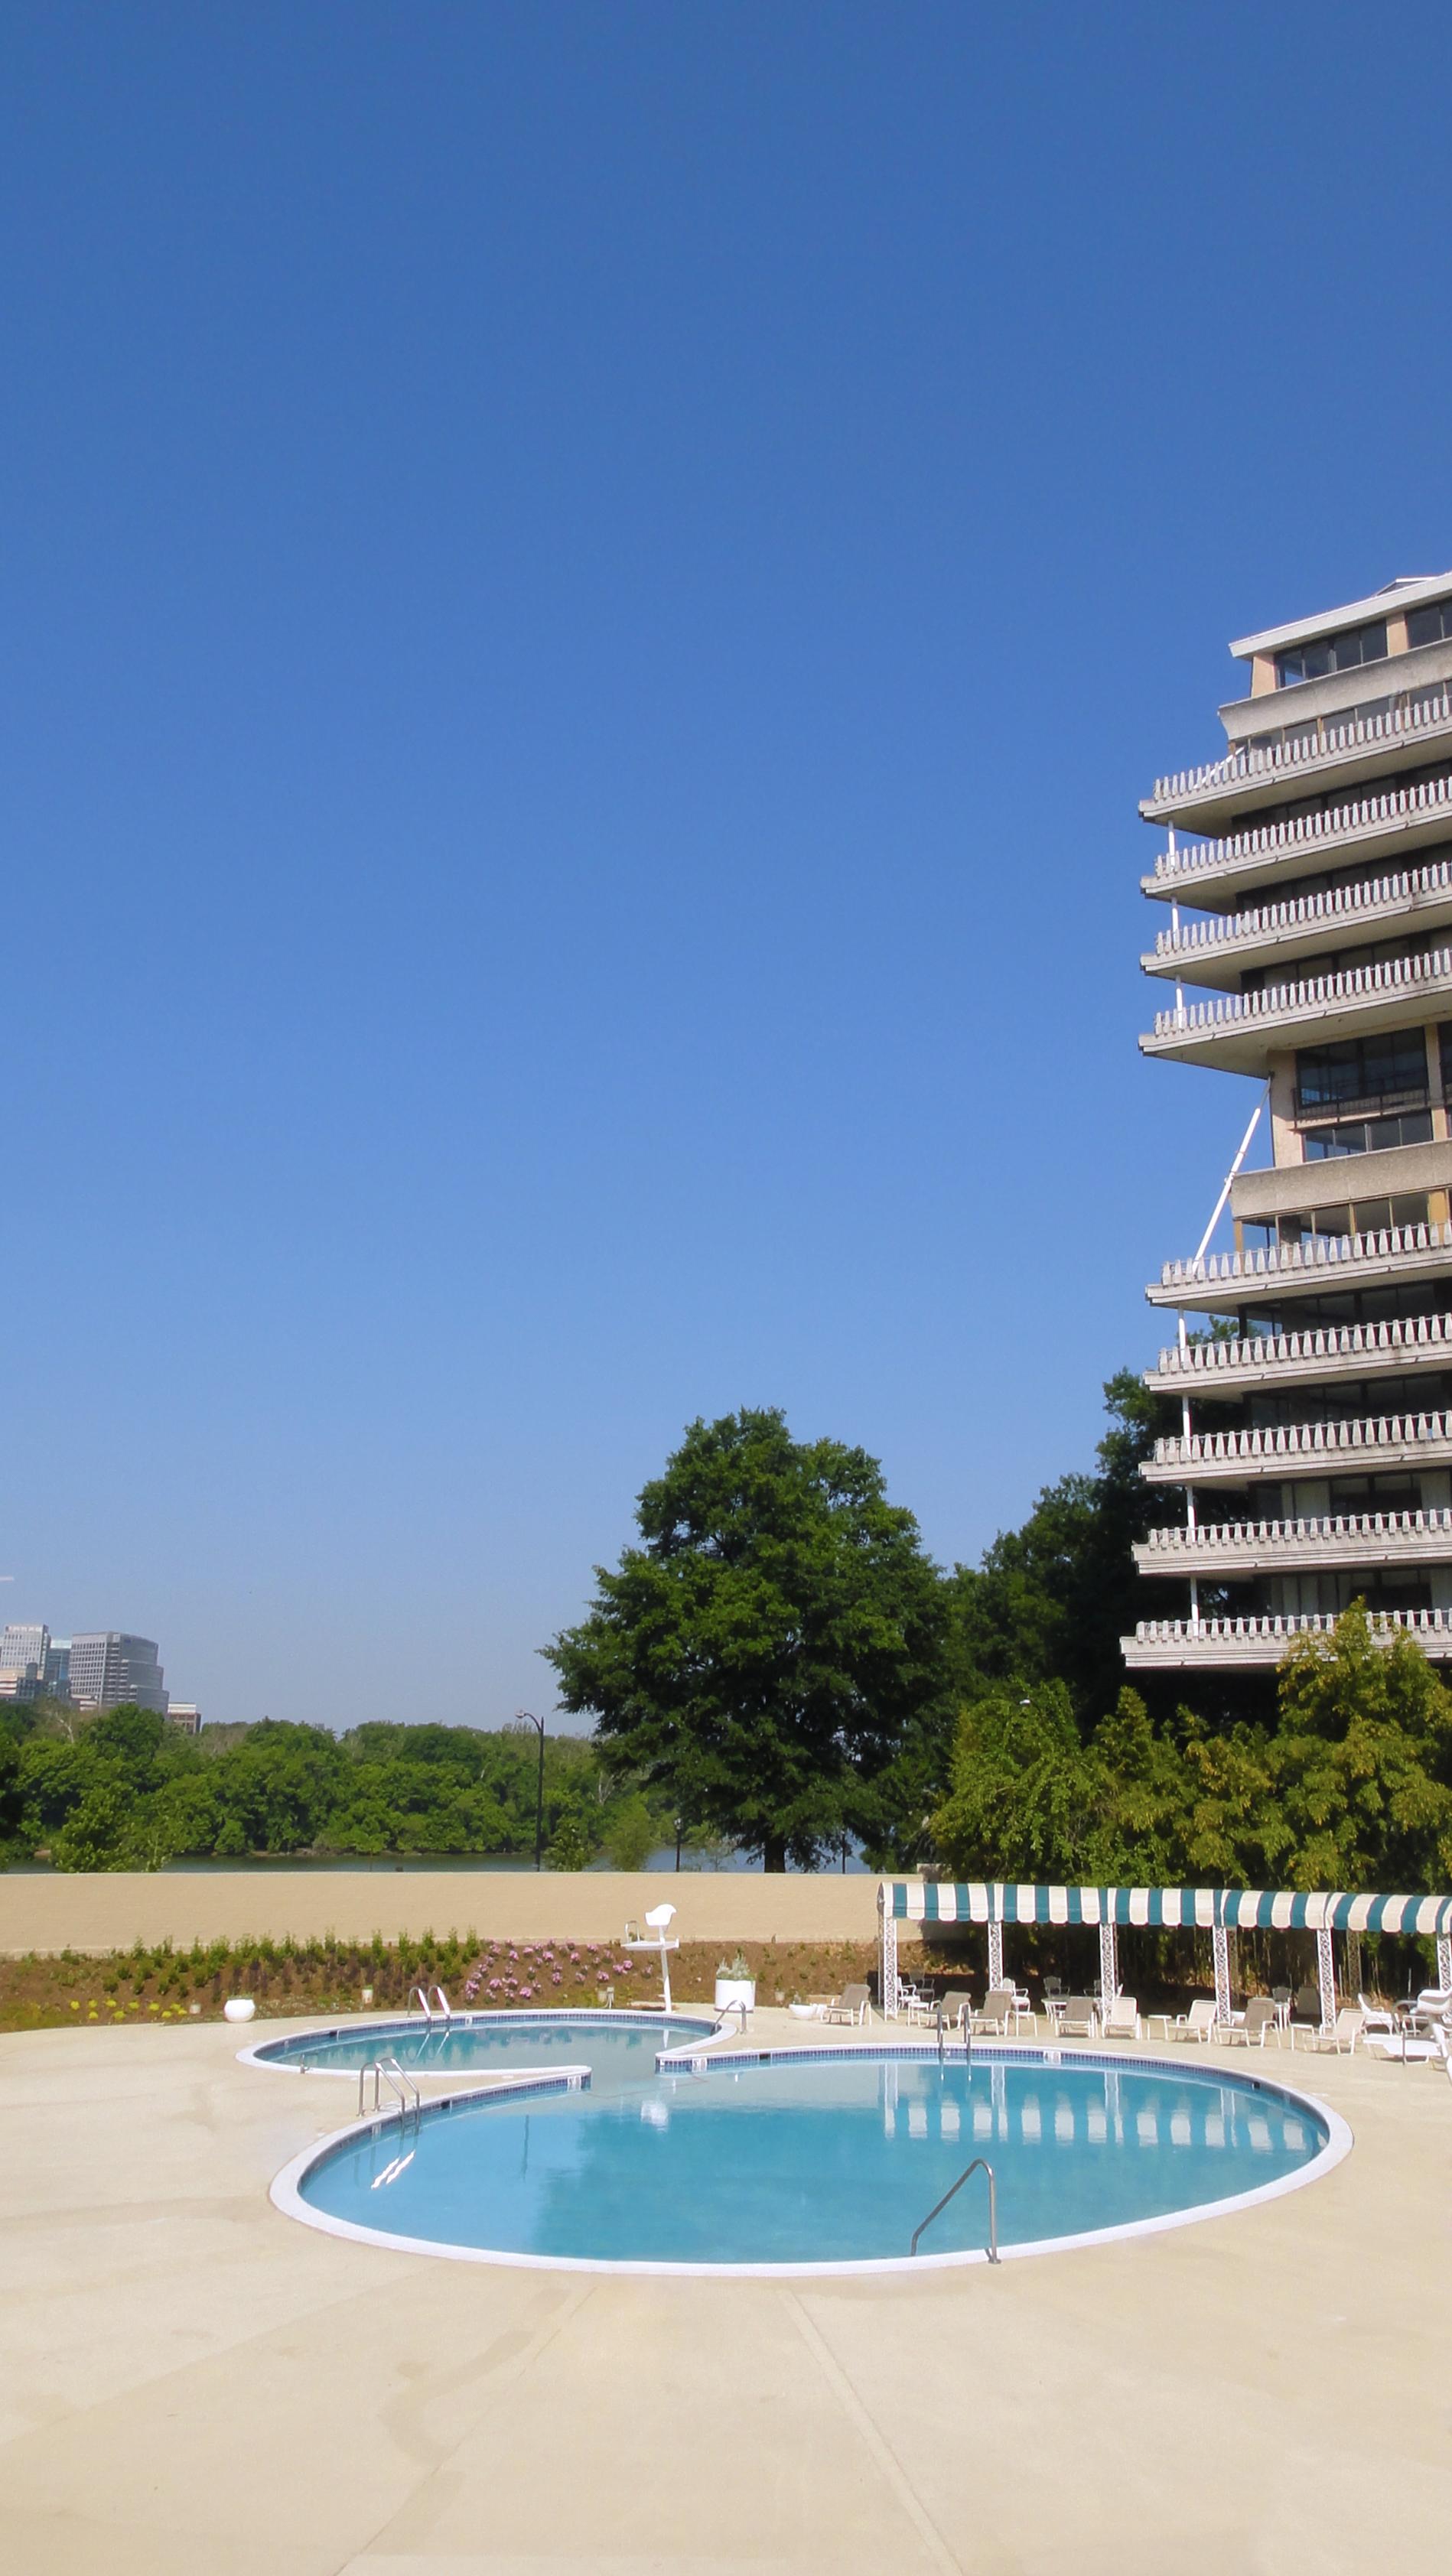 711-N Watergate East